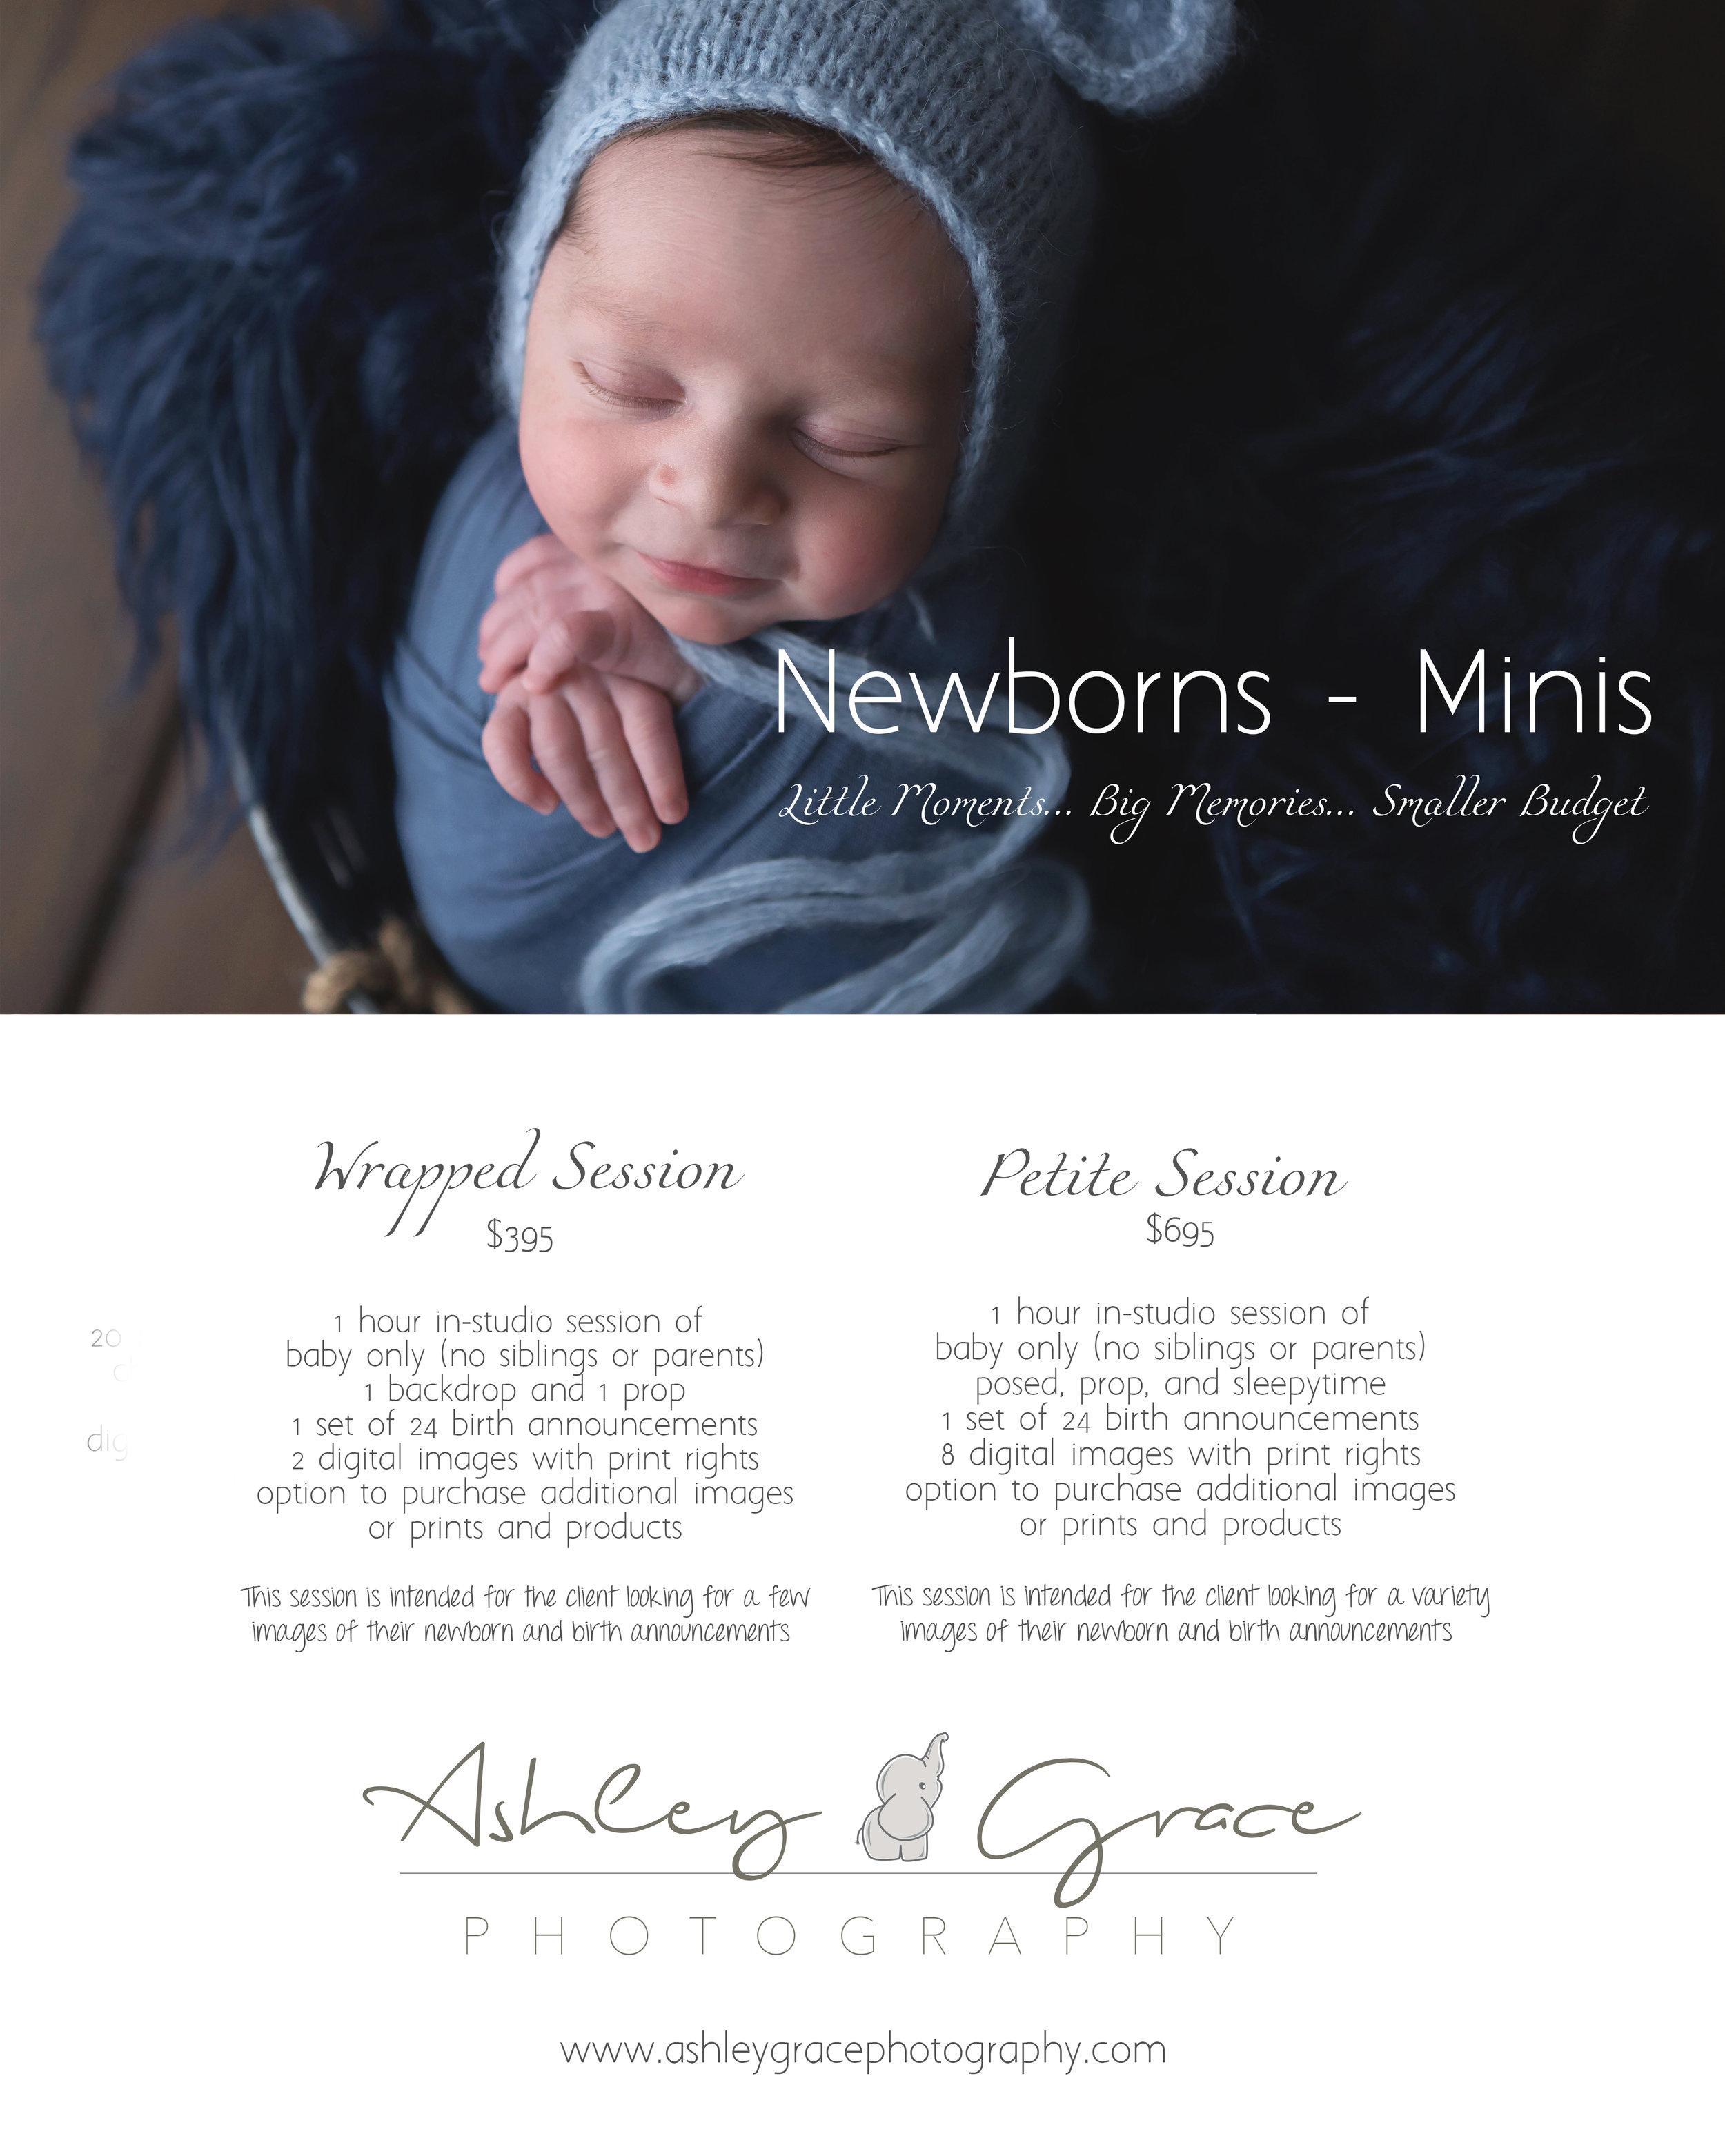 Pricing - Newborn mini.jpg